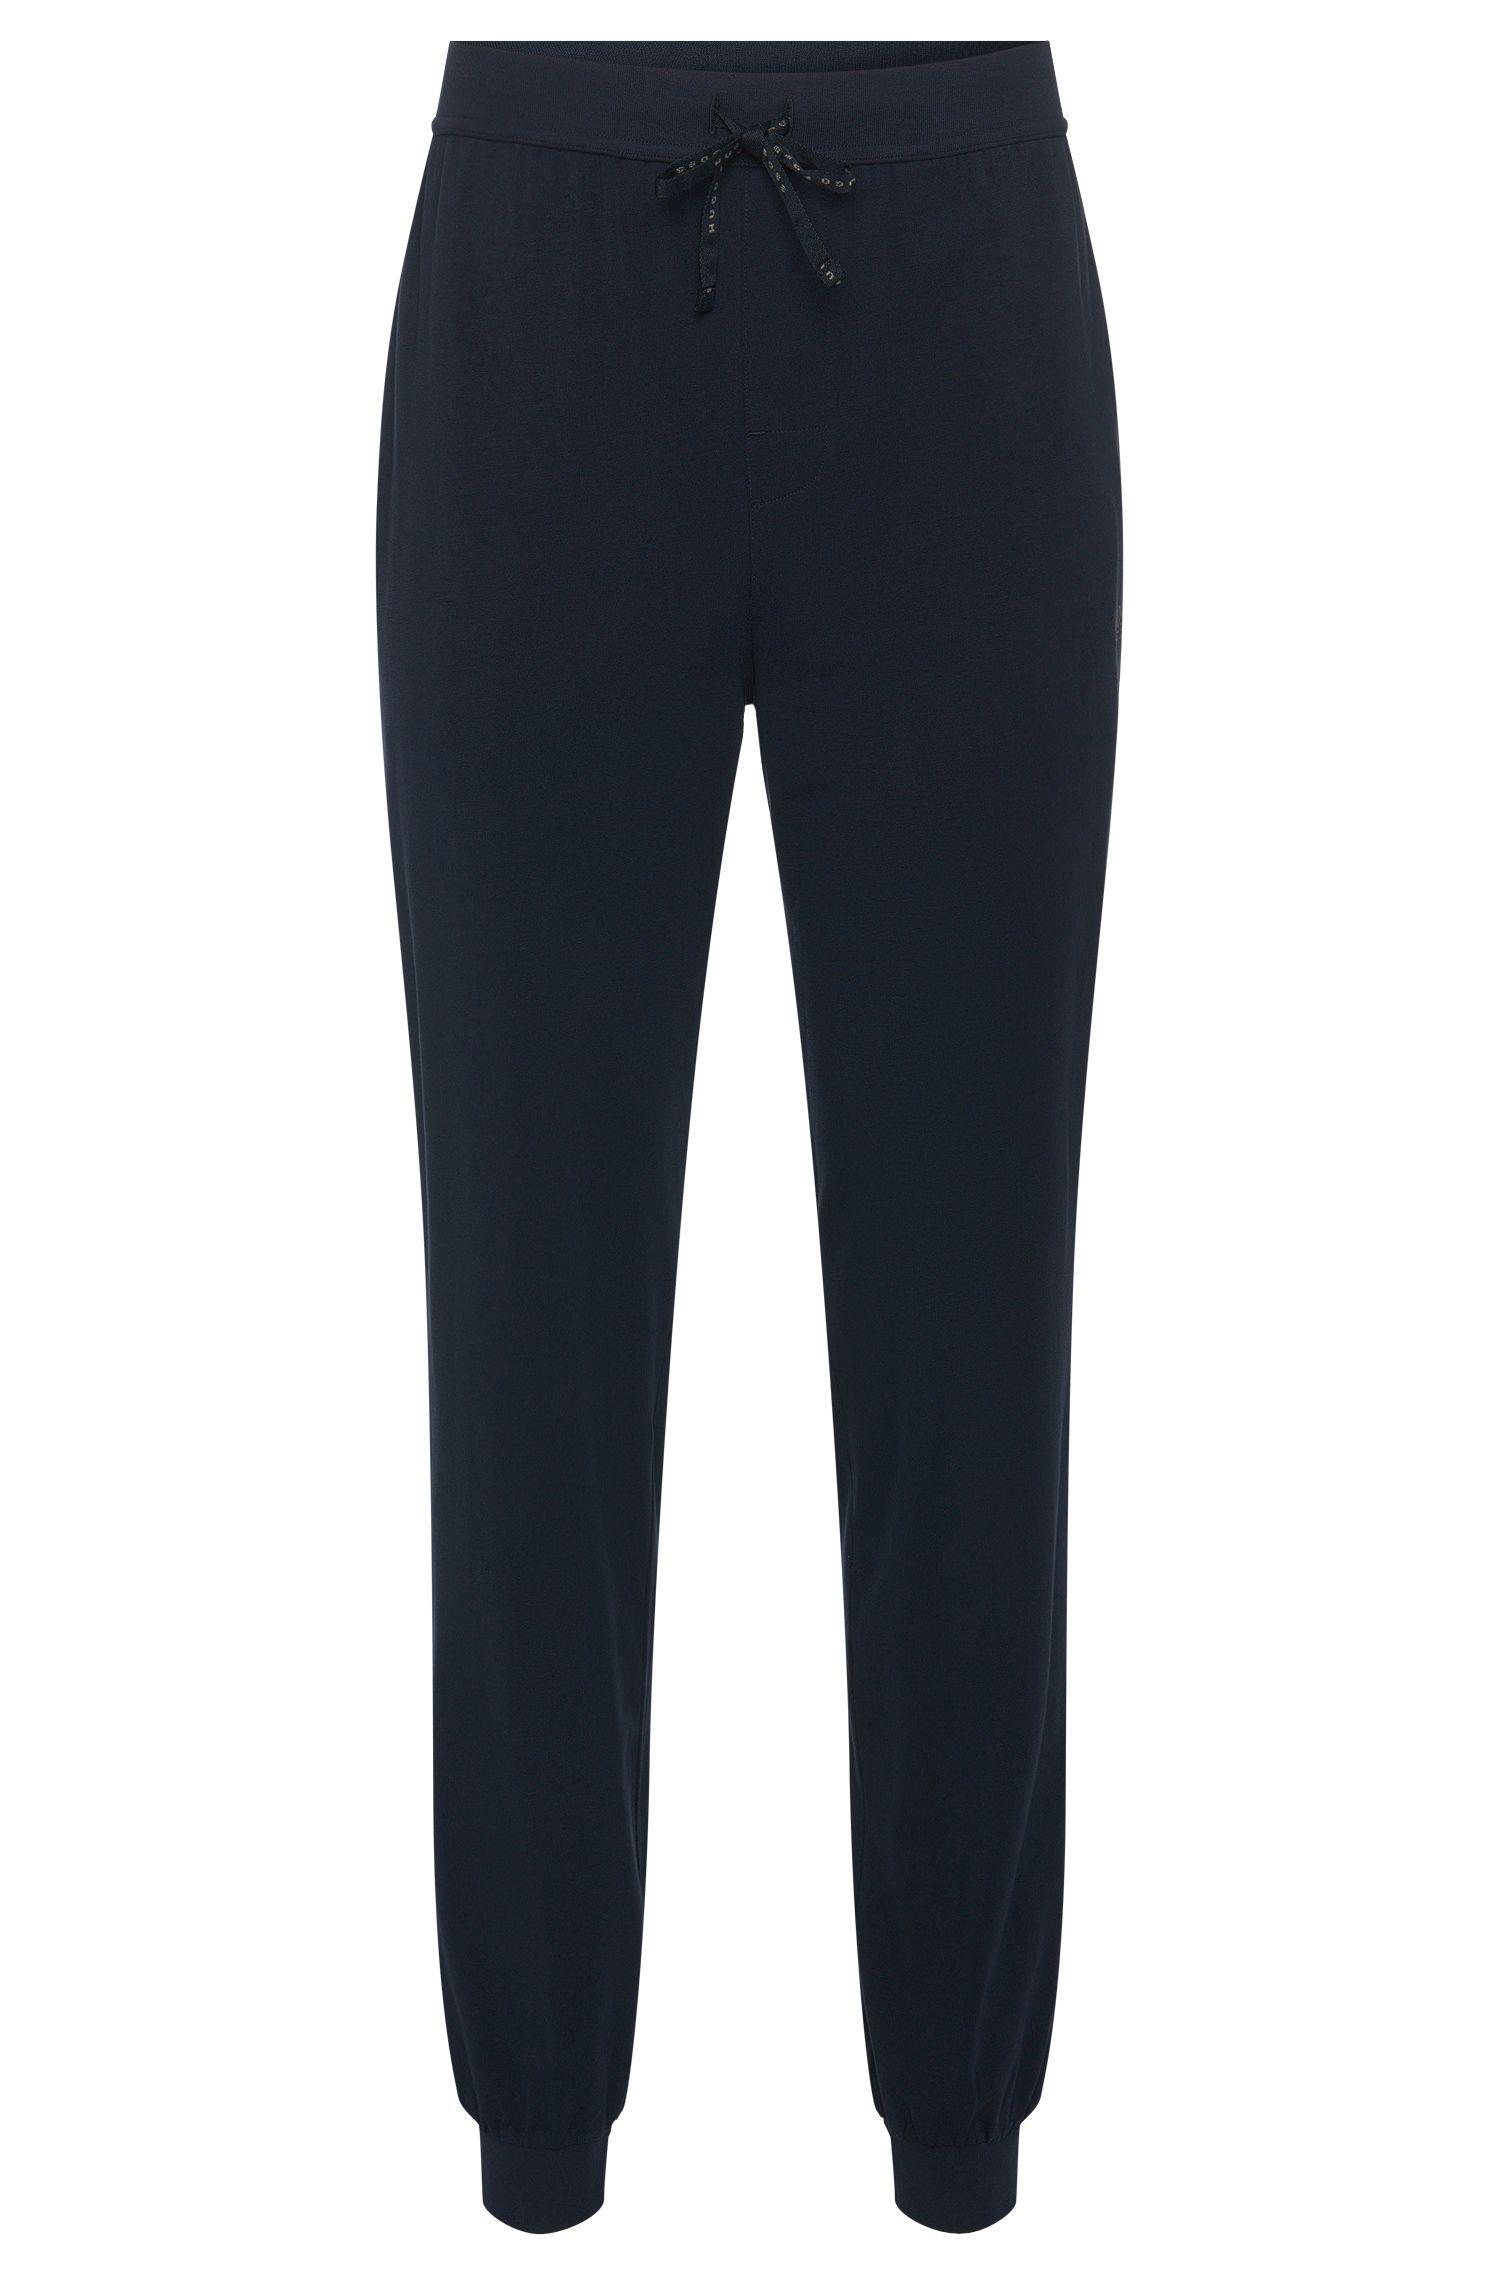 Sweathose aus Stretch-Baumwolle mit Tunnelzug: 'Long Pant CW Cuffs'